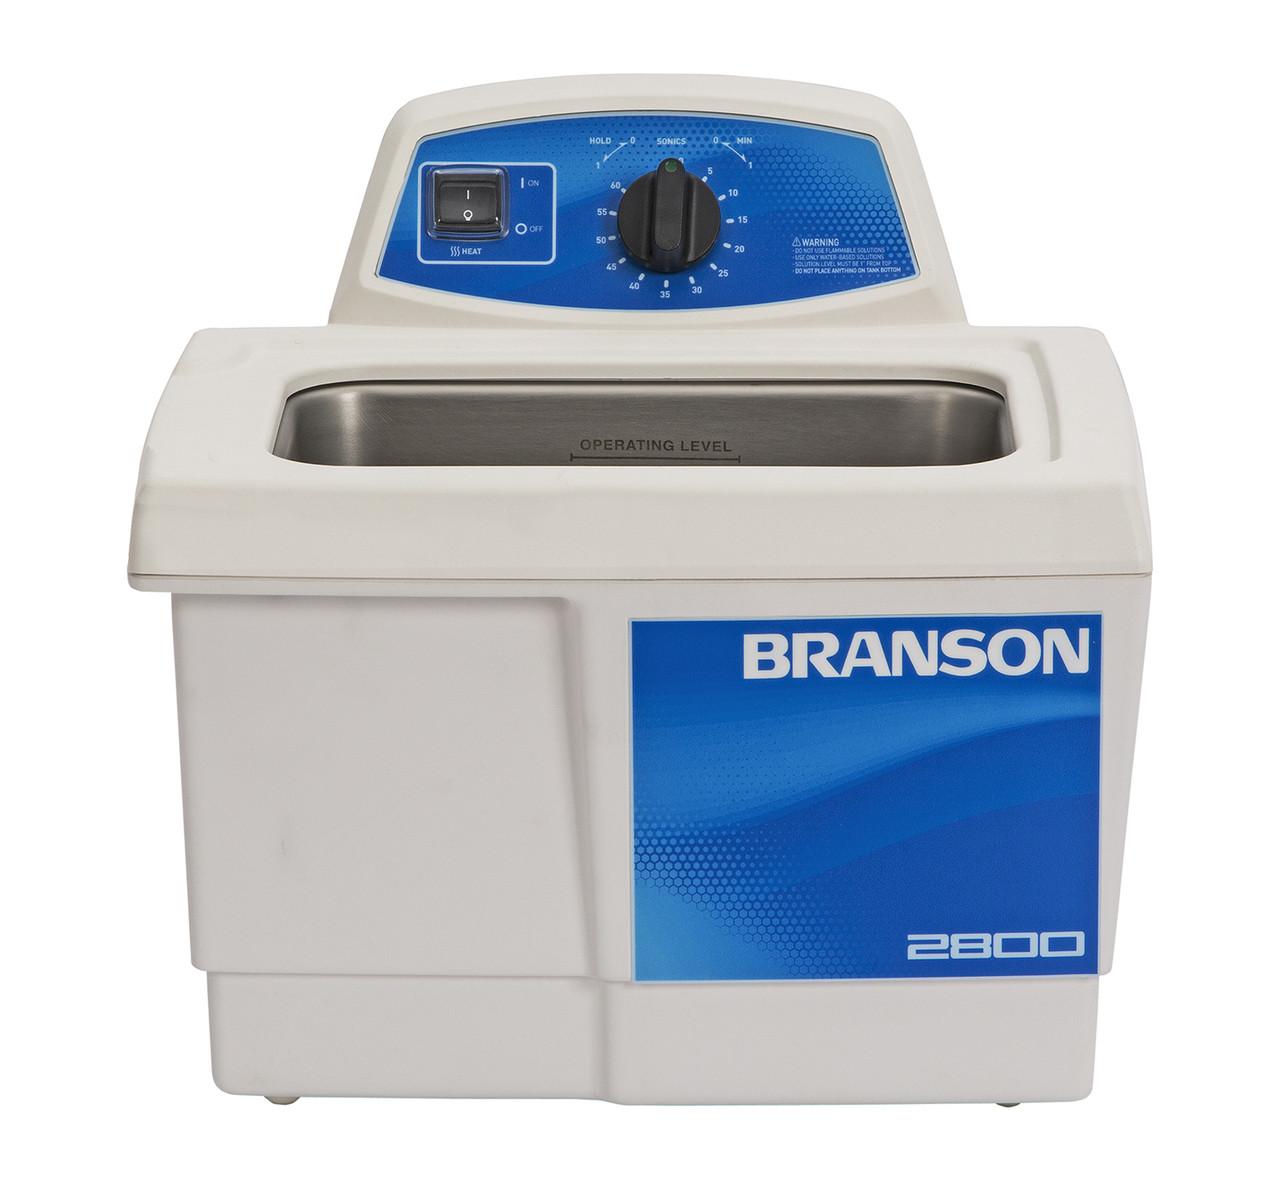 Branson M2800H Ultrasonic Cleaner